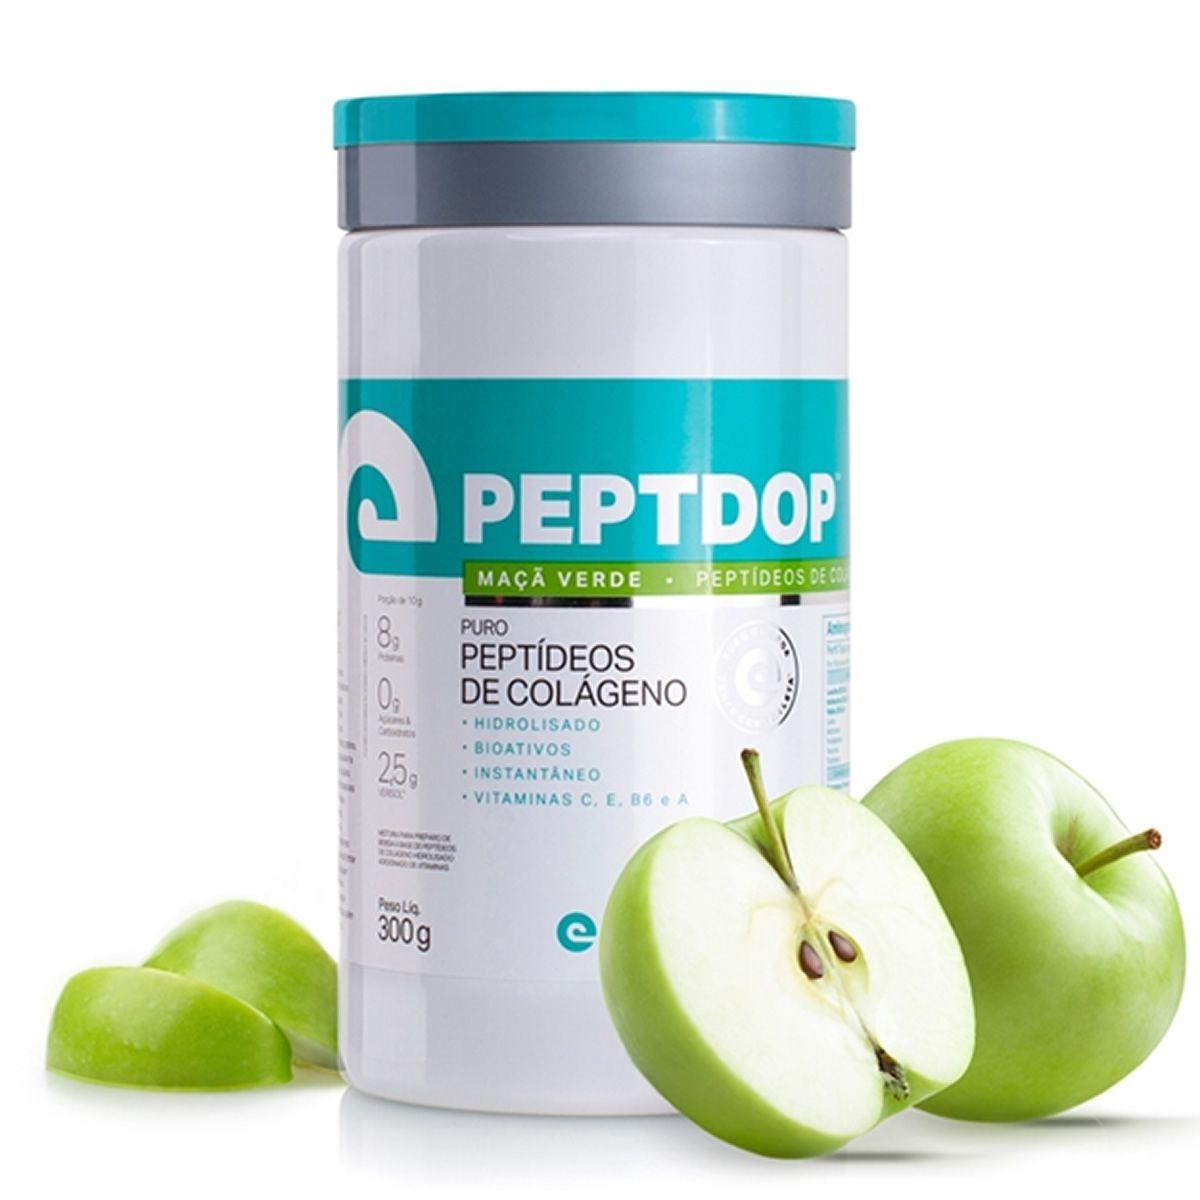 Peptdop Colágeno Hidrolisado 300g Elemento Puro - Maça Verde